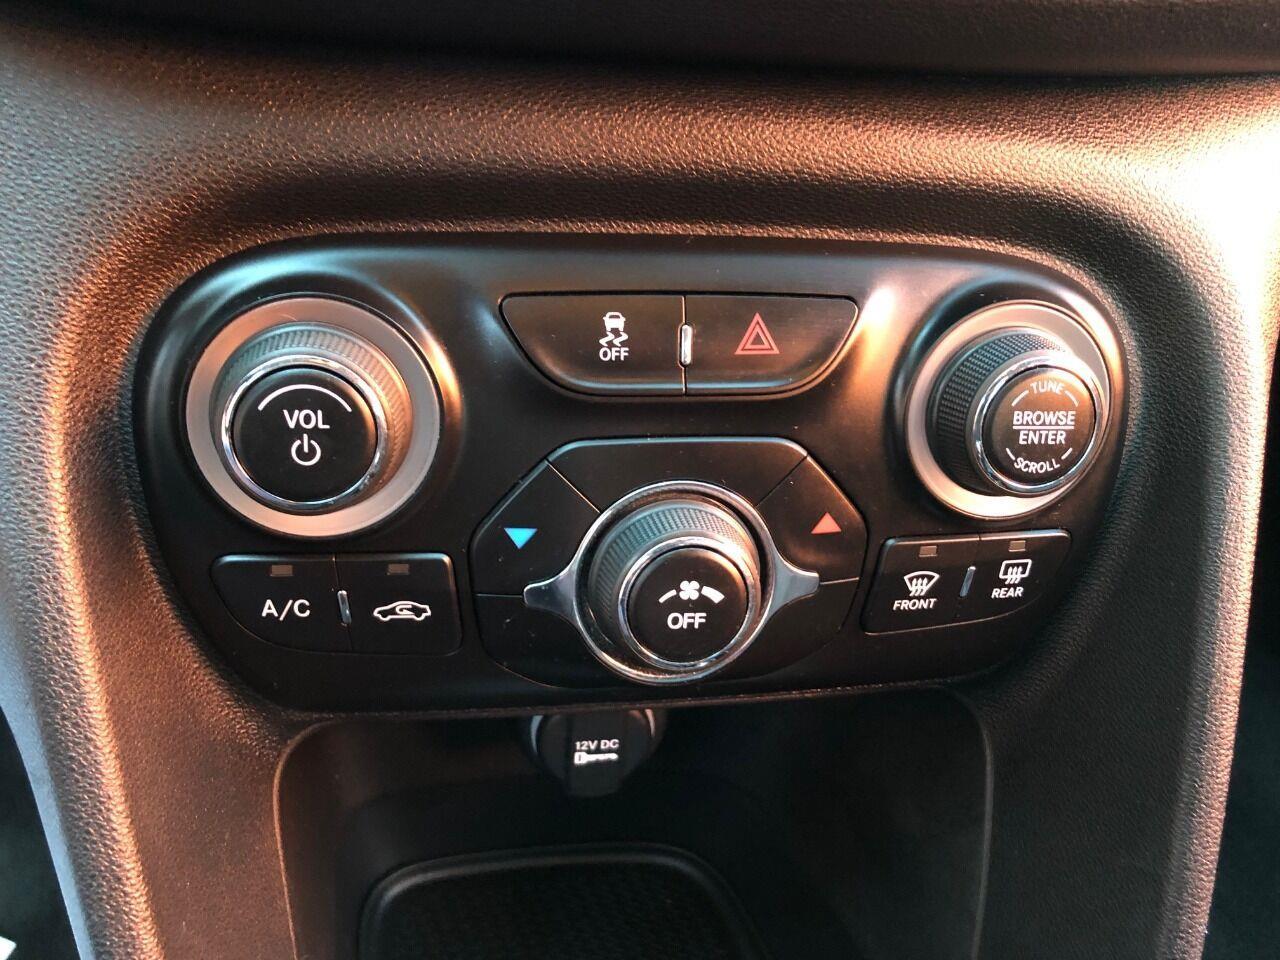 2013 Dodge Dart (CC-1423500) for sale in Saint Charles, Missouri